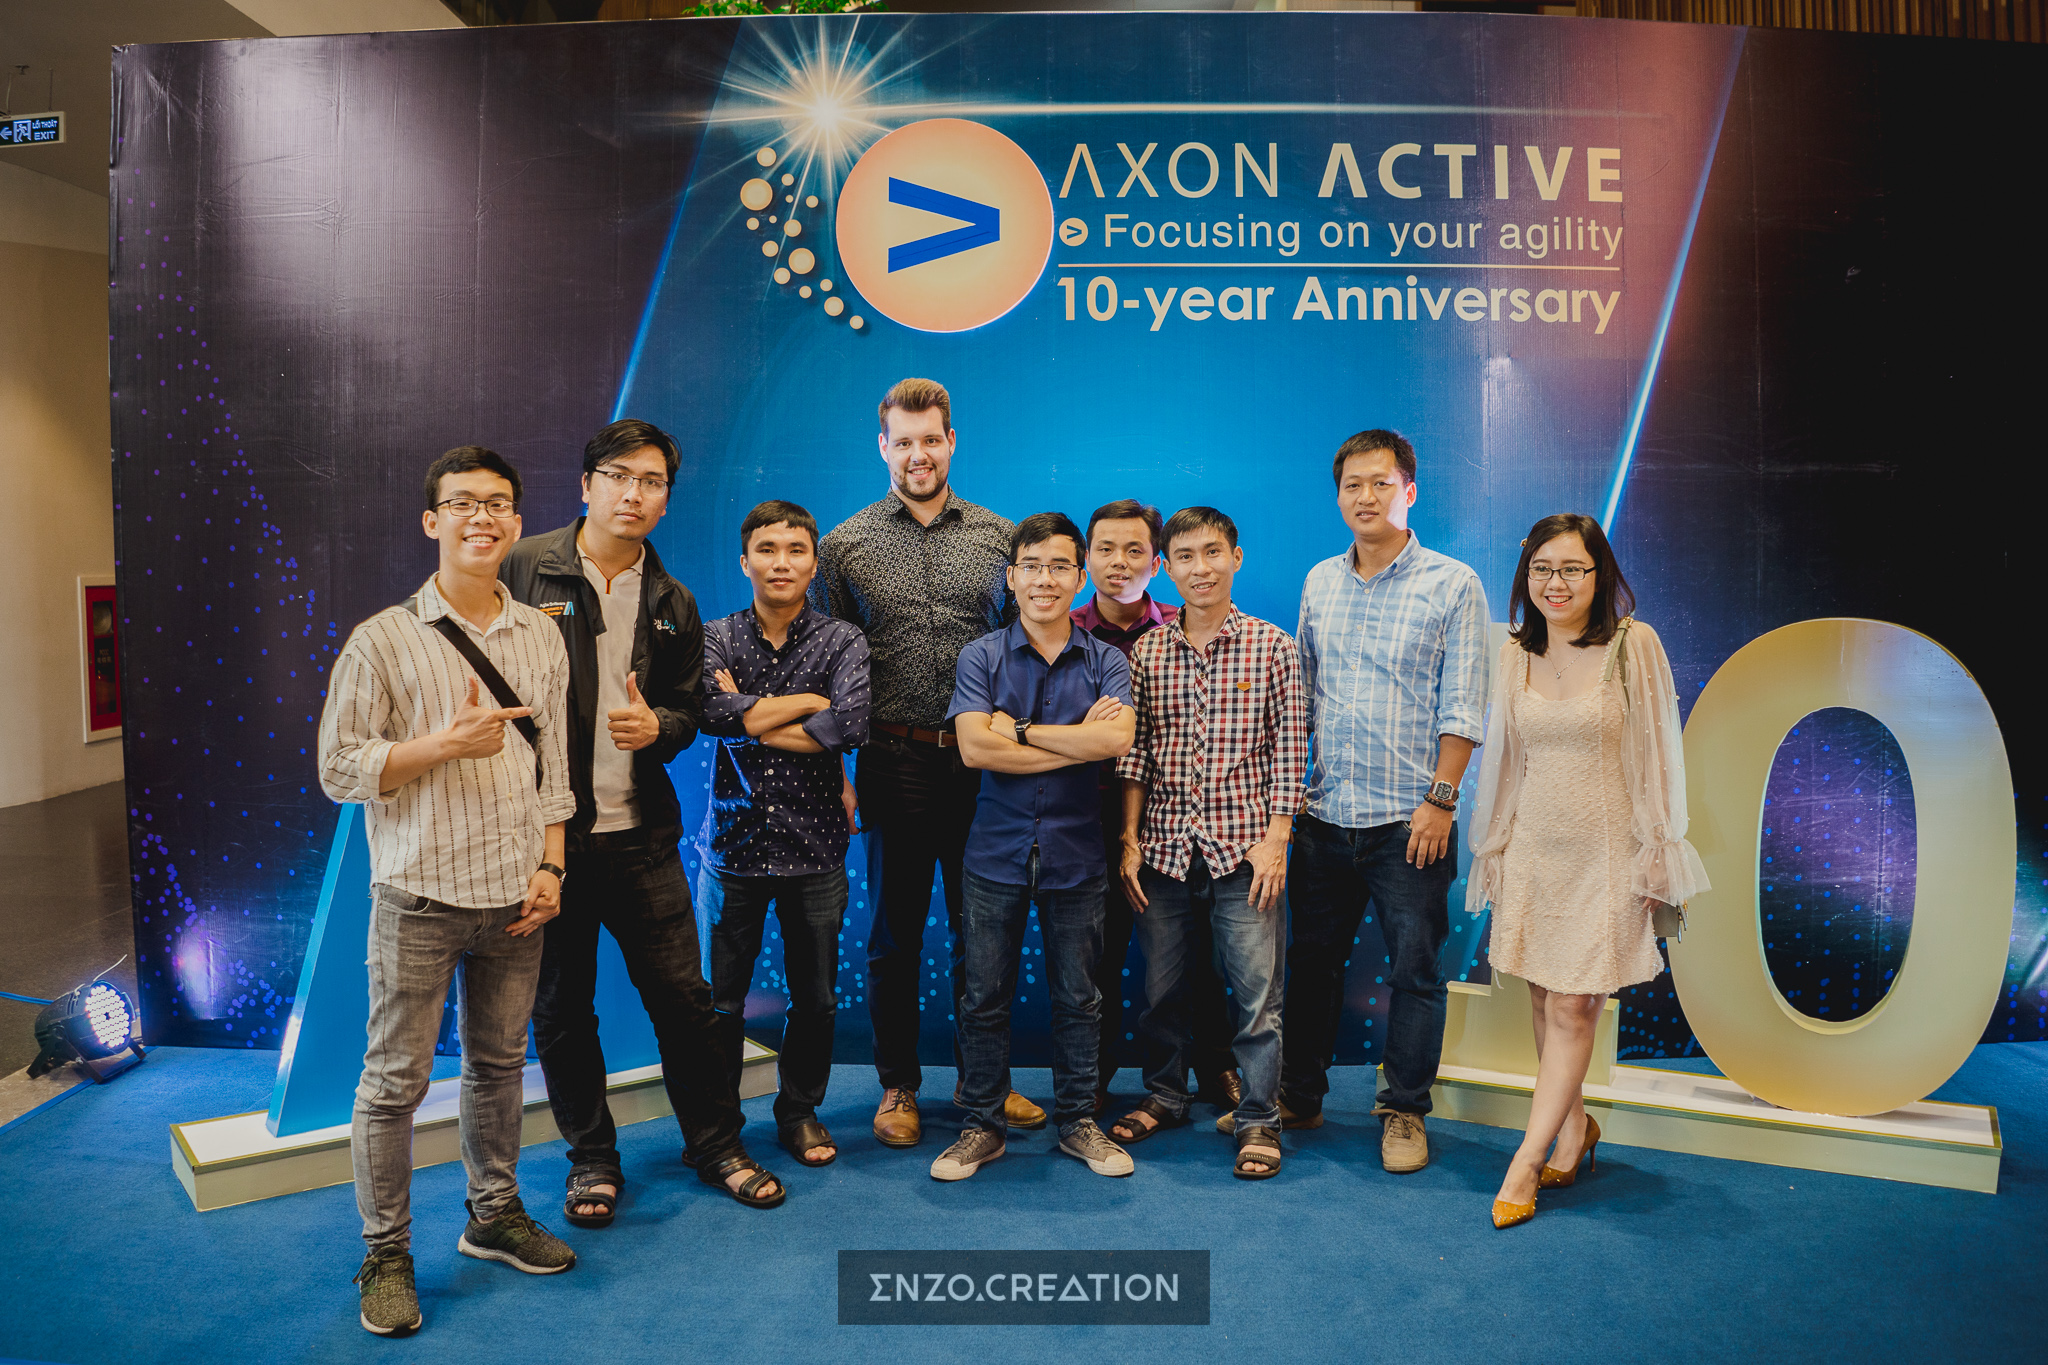 AxonAnniversary-352-ROJ01533.jpg